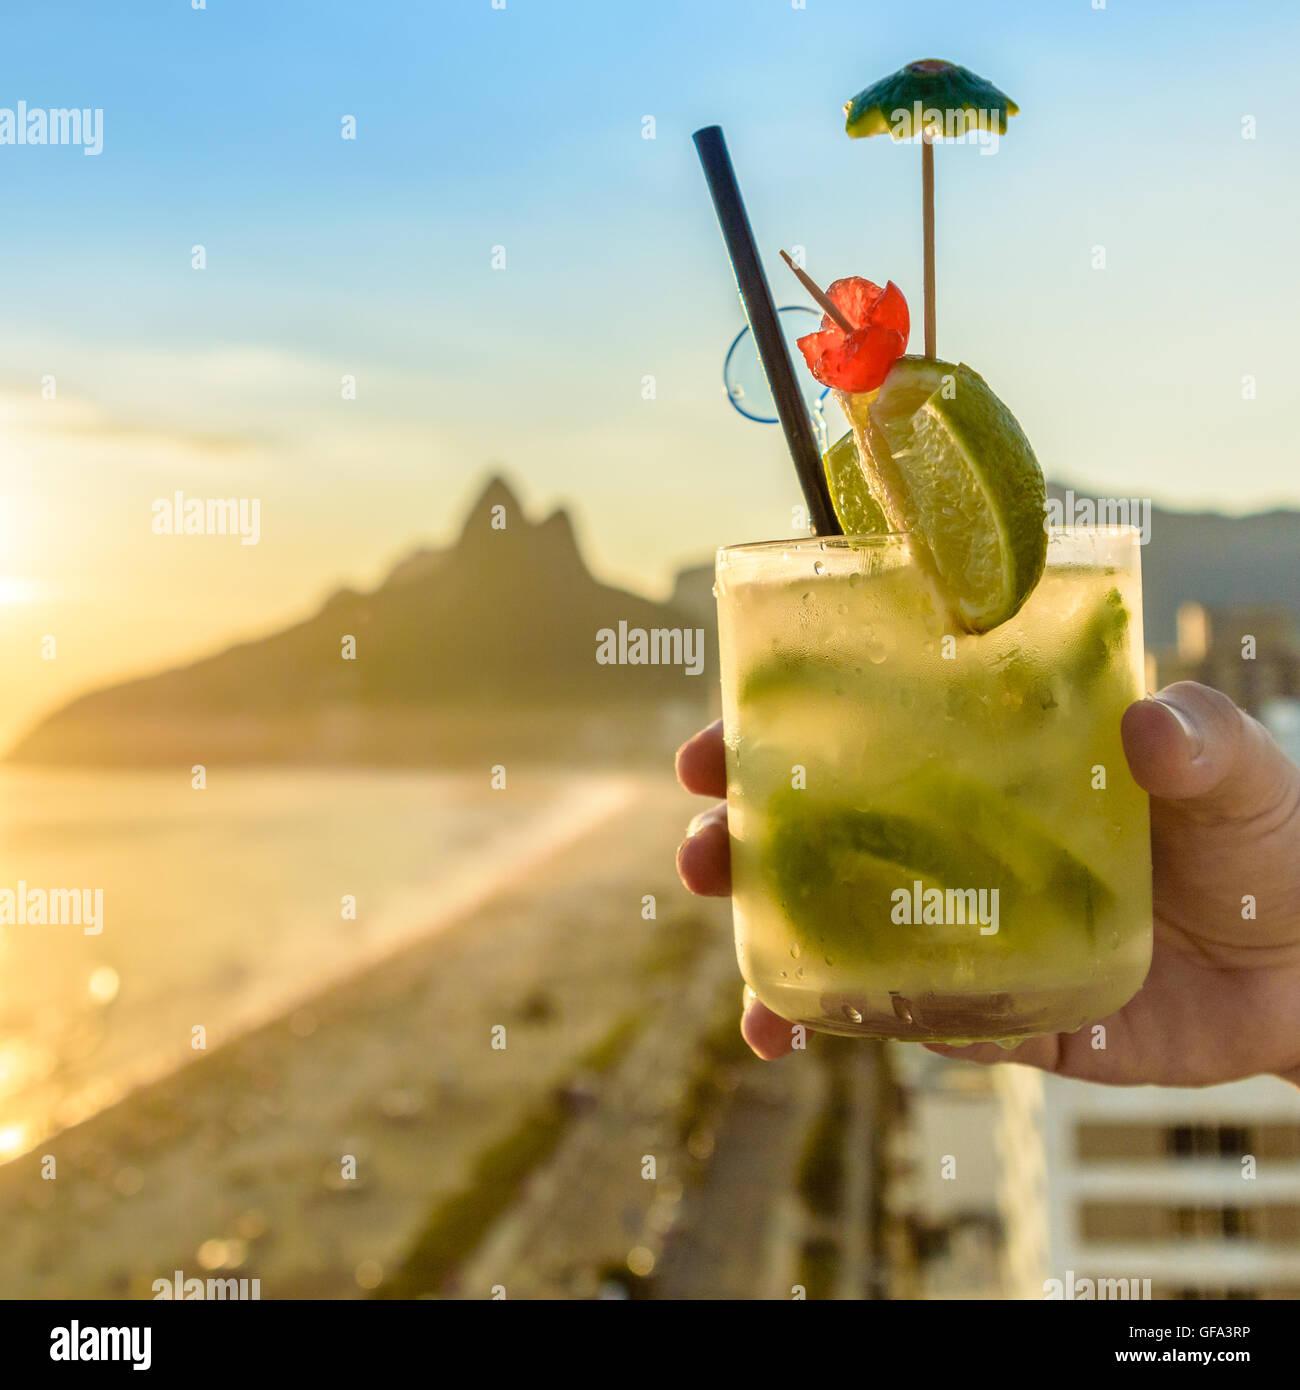 A delicious kiwi caipirinha drink overlooking the iconic Ipanema beach in Rio de Janeiro, Brazil Stock Photo